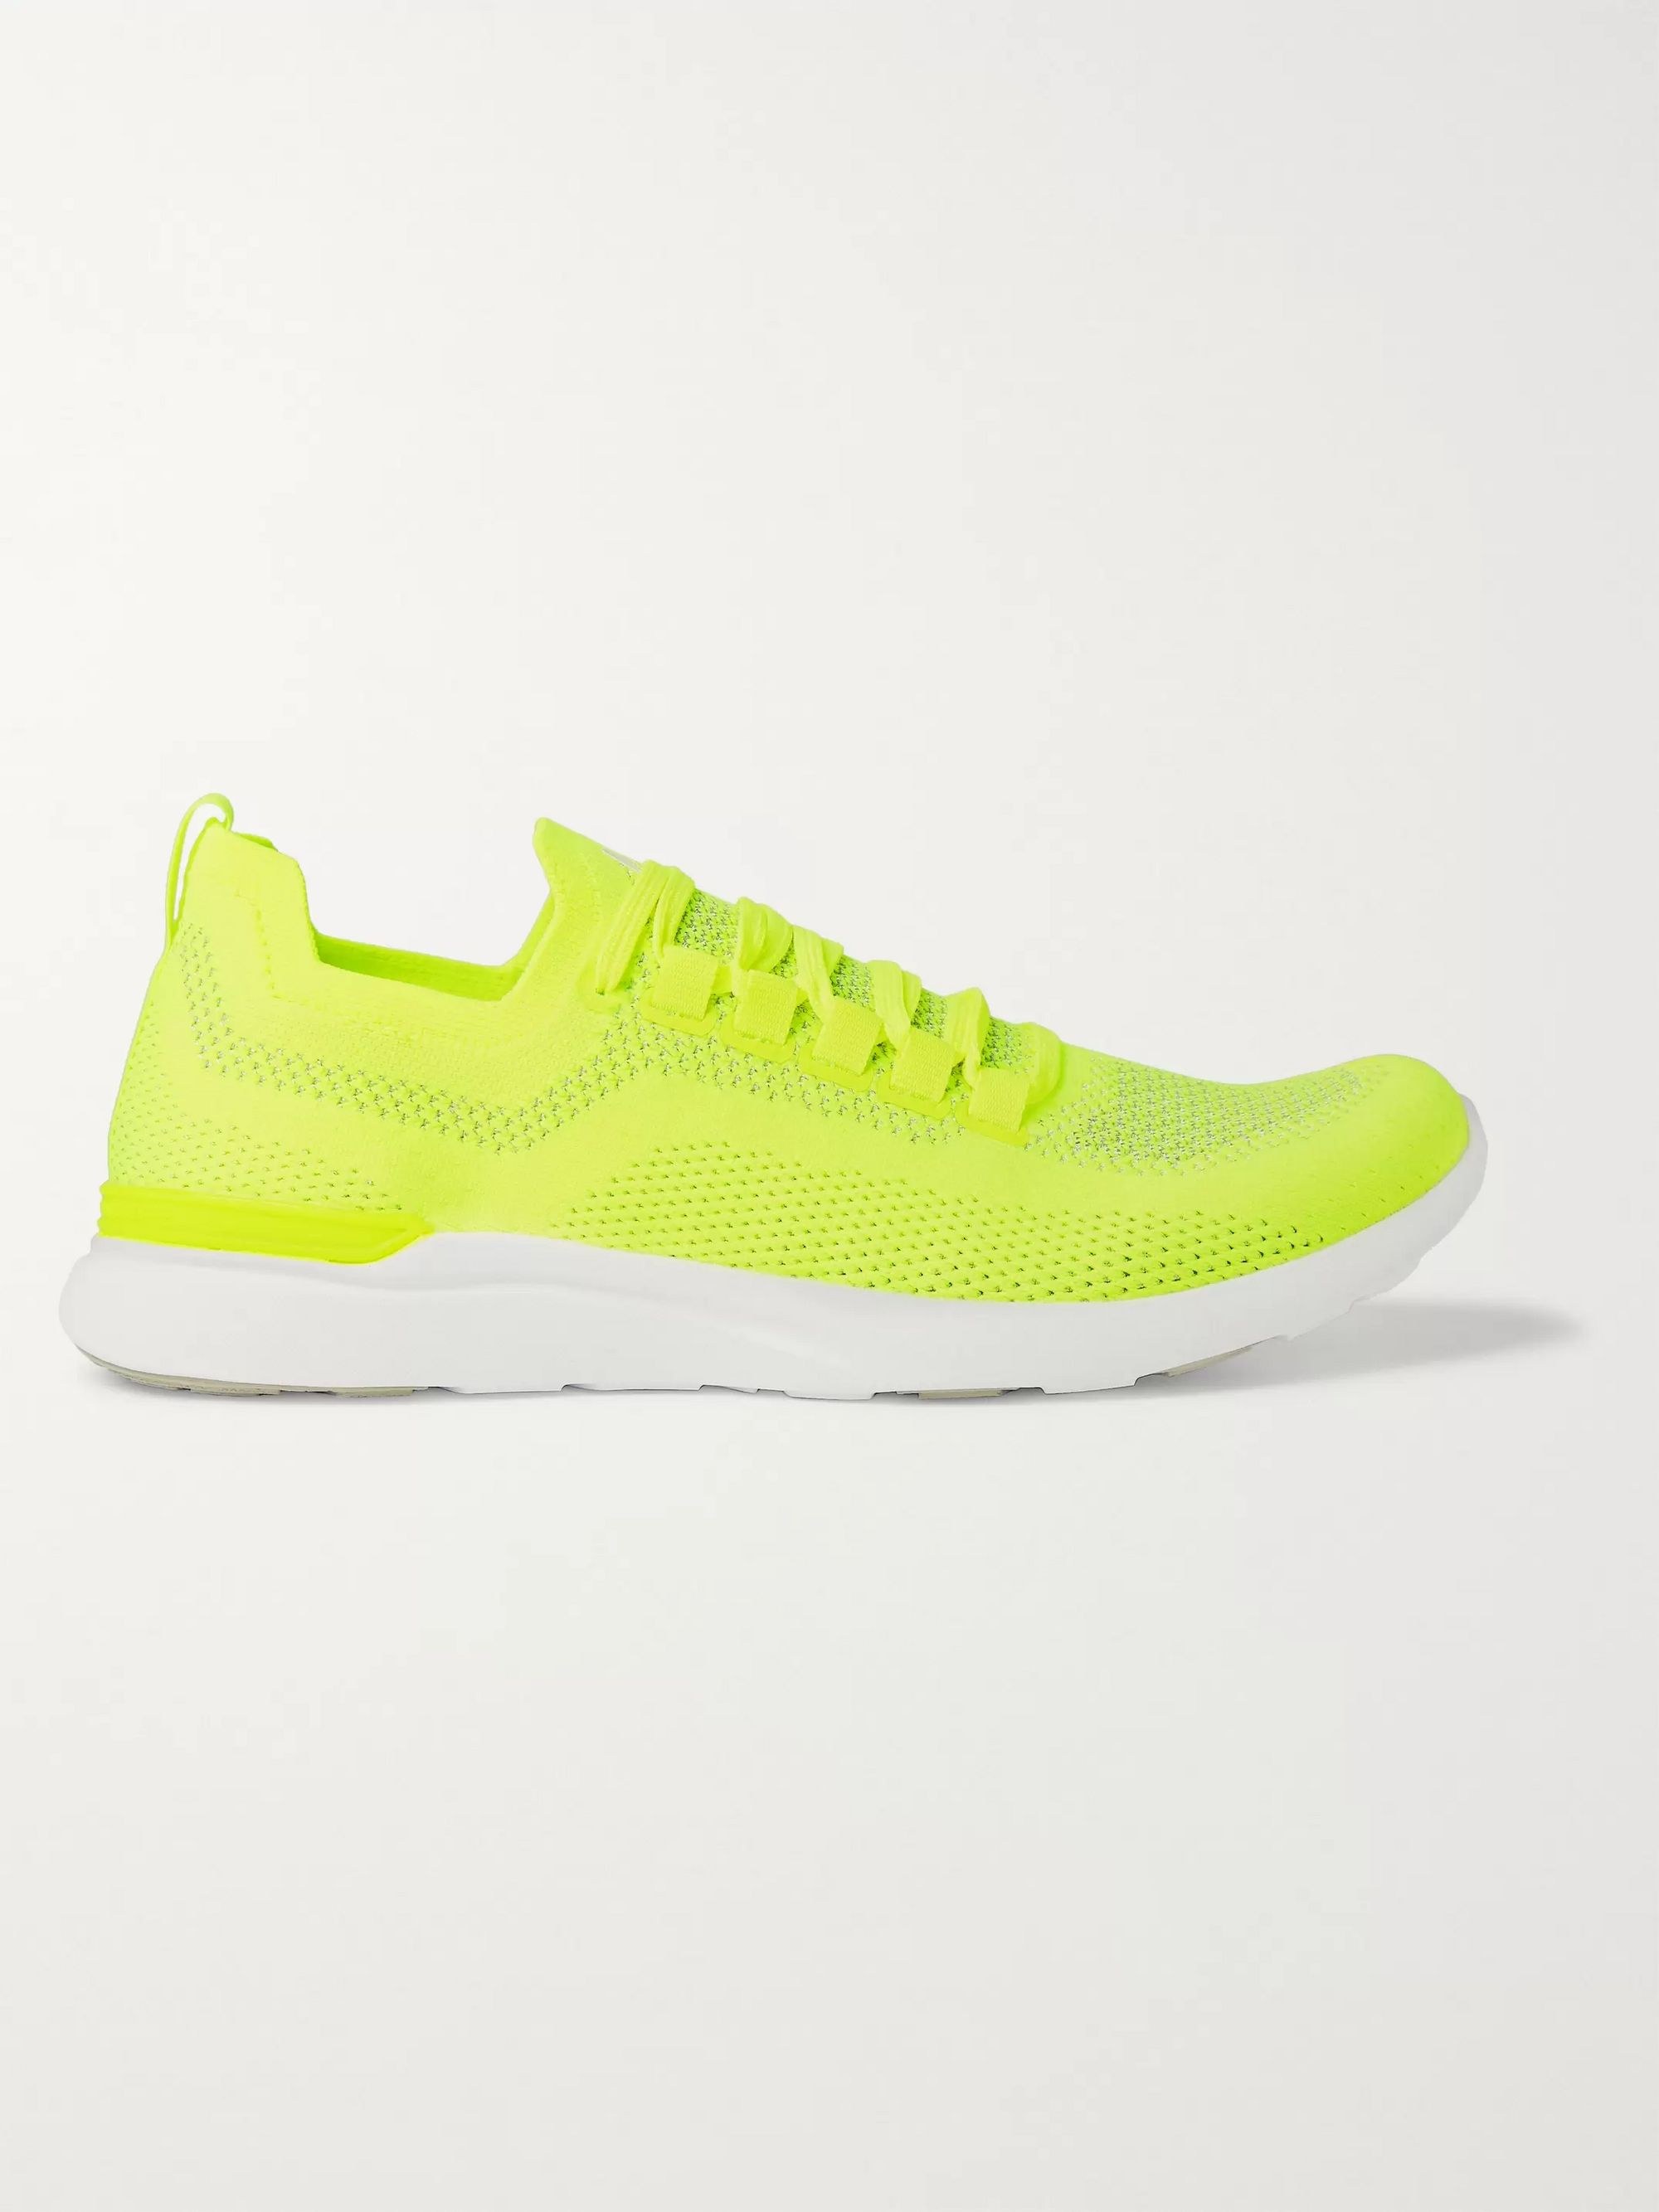 nike running yellow shoes